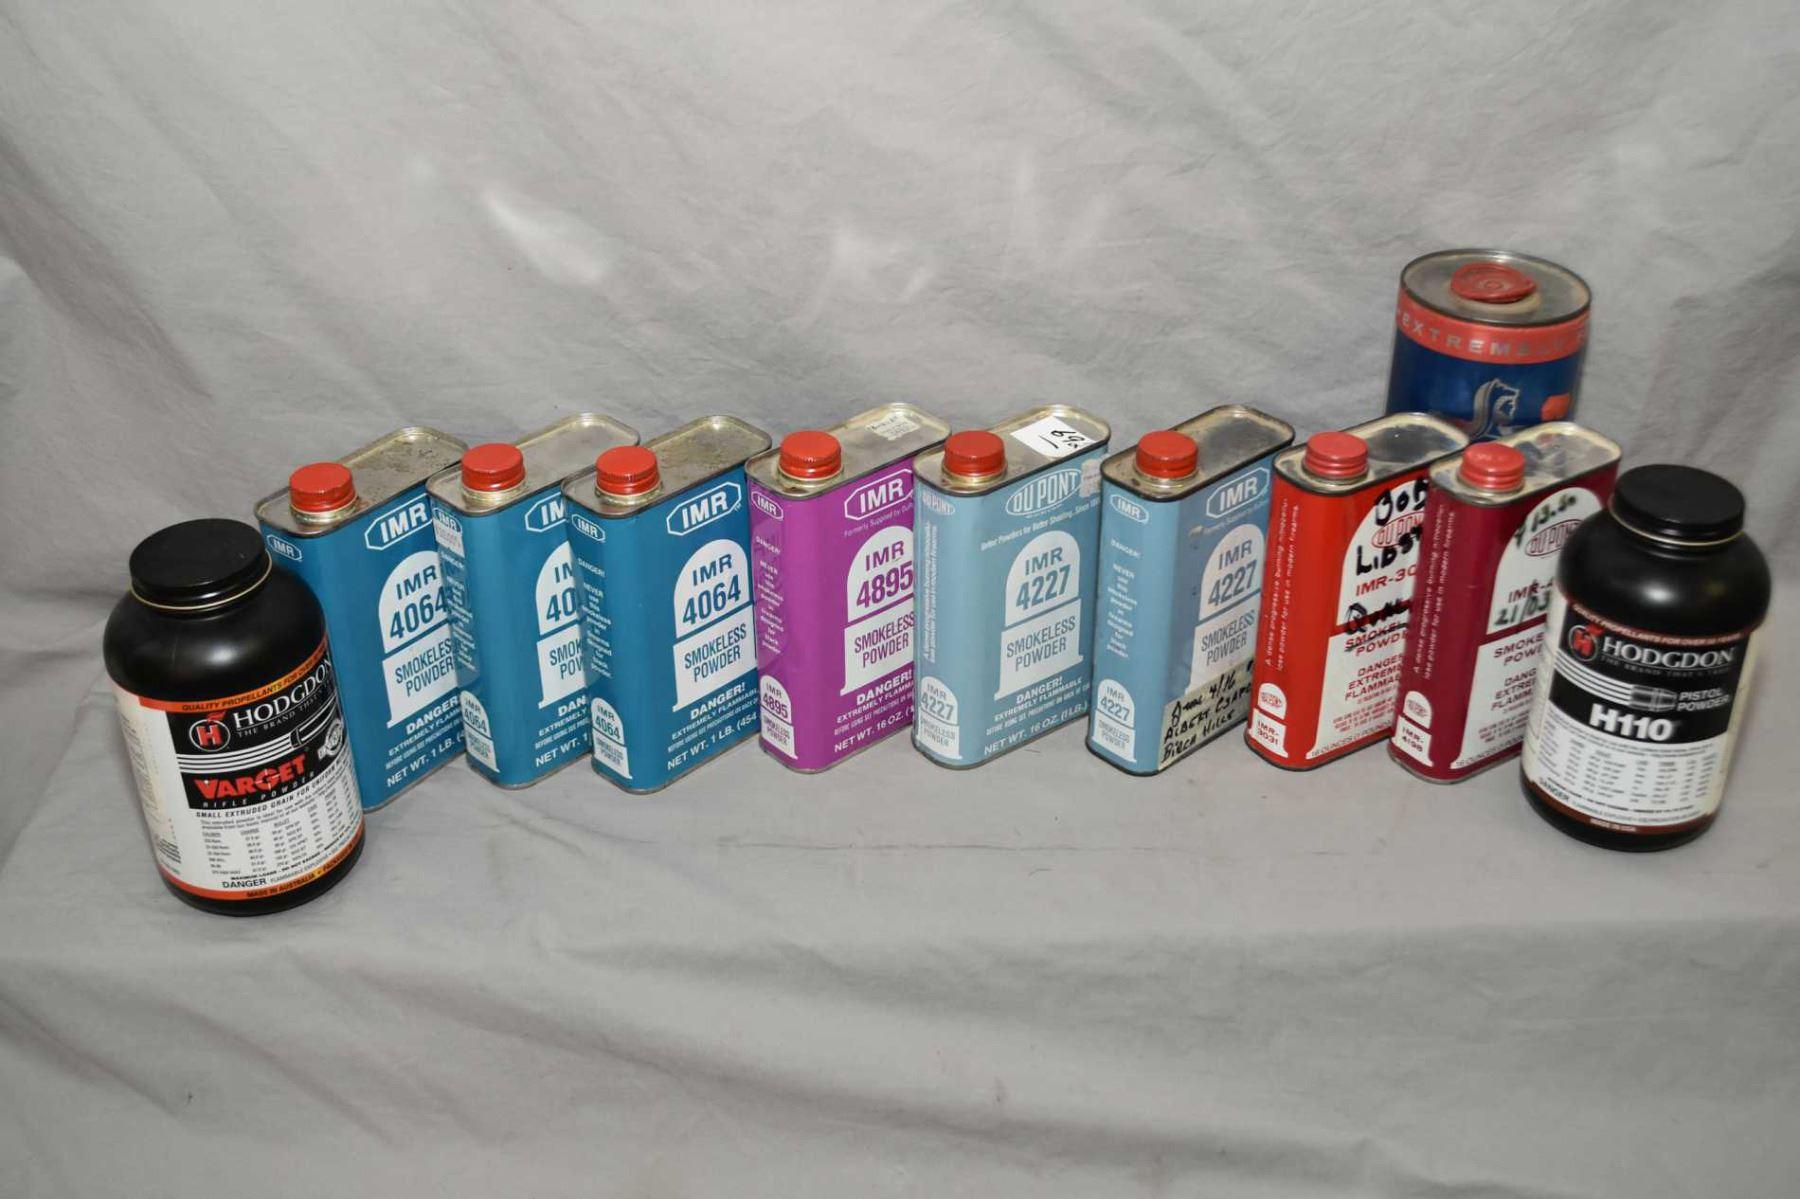 Box Lot : Asstd Gun Powder : 3 Lbs IMR 4064 - 1 Lb IMR 4895